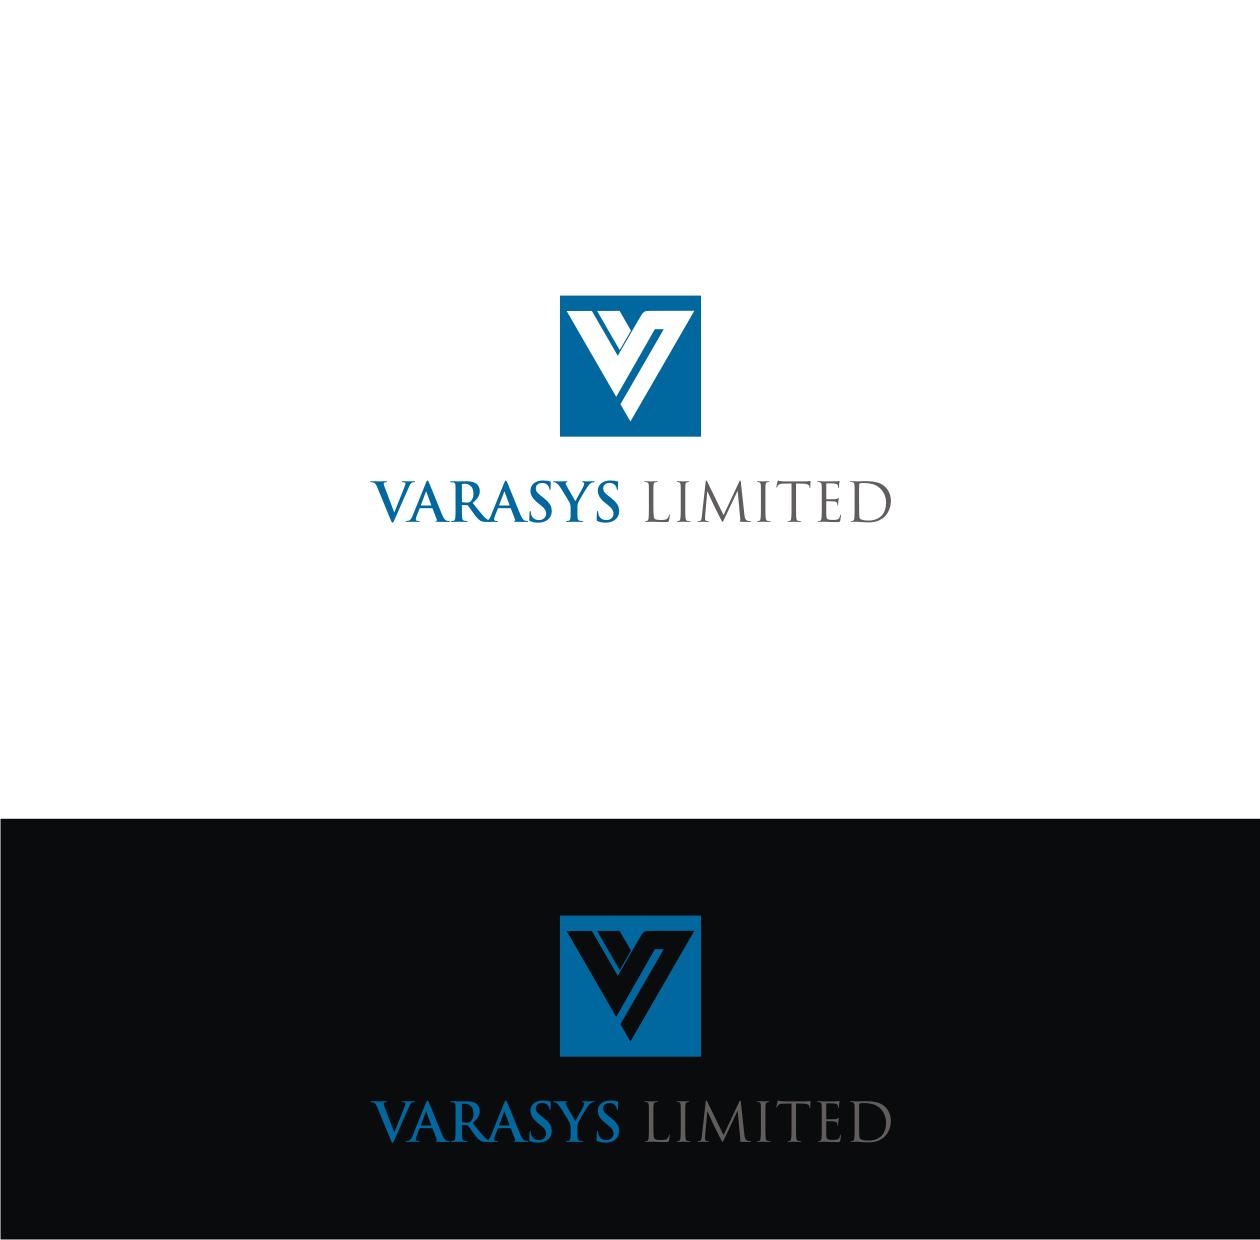 Logo Design by Sigitumarali Sigit - Entry No. 117 in the Logo Design Contest Artistic Logo Design for VARASYS Limited.